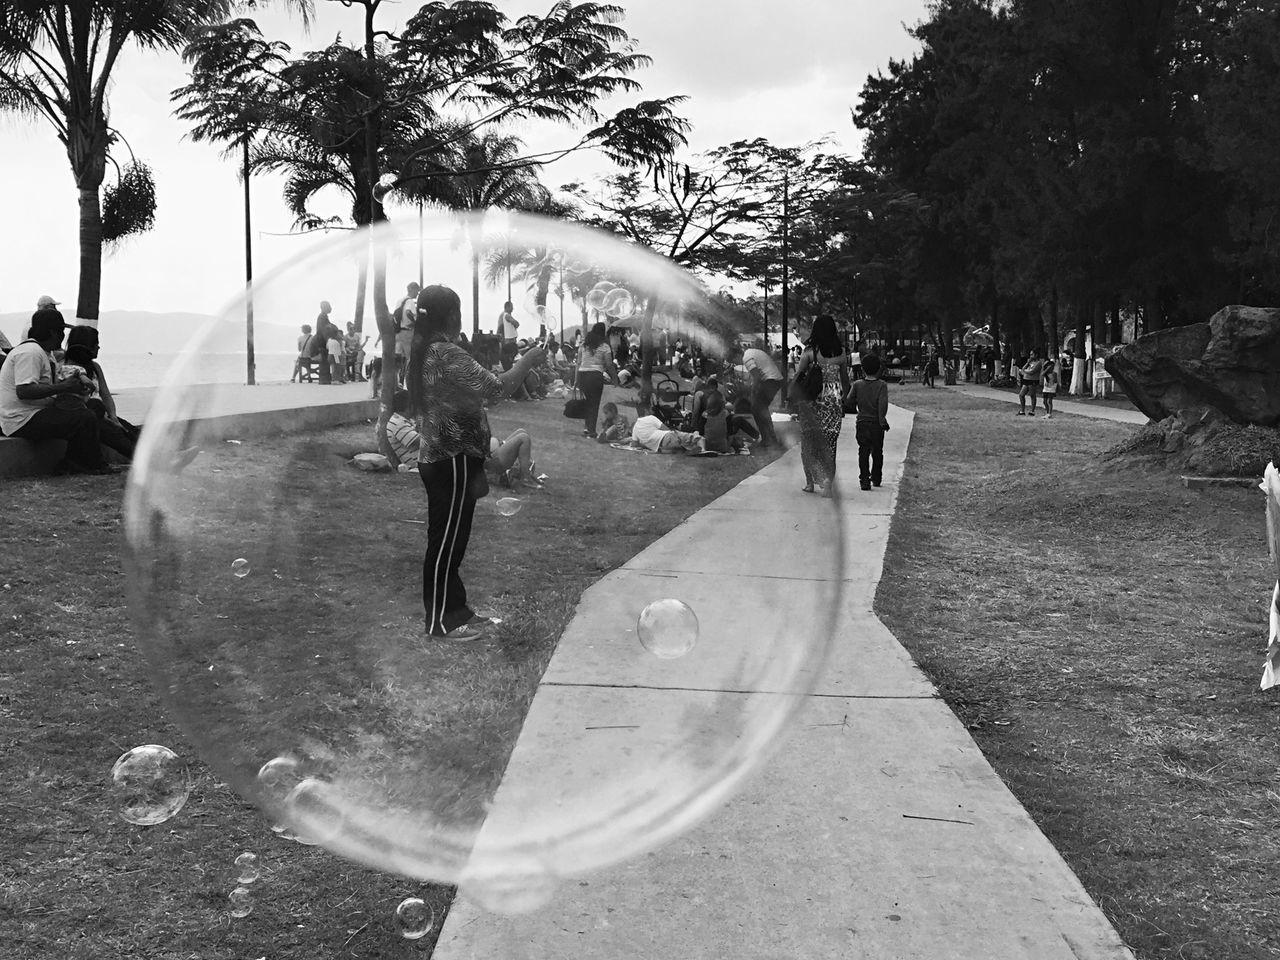 Life's bubble Streetphotography Monochrome Blackandwhite NEM Black&white The Moment - 2015 EyeEm Awards The Street Photographer - 2015 EyeEm Awards NEM Street Street Photography NEM Submissions